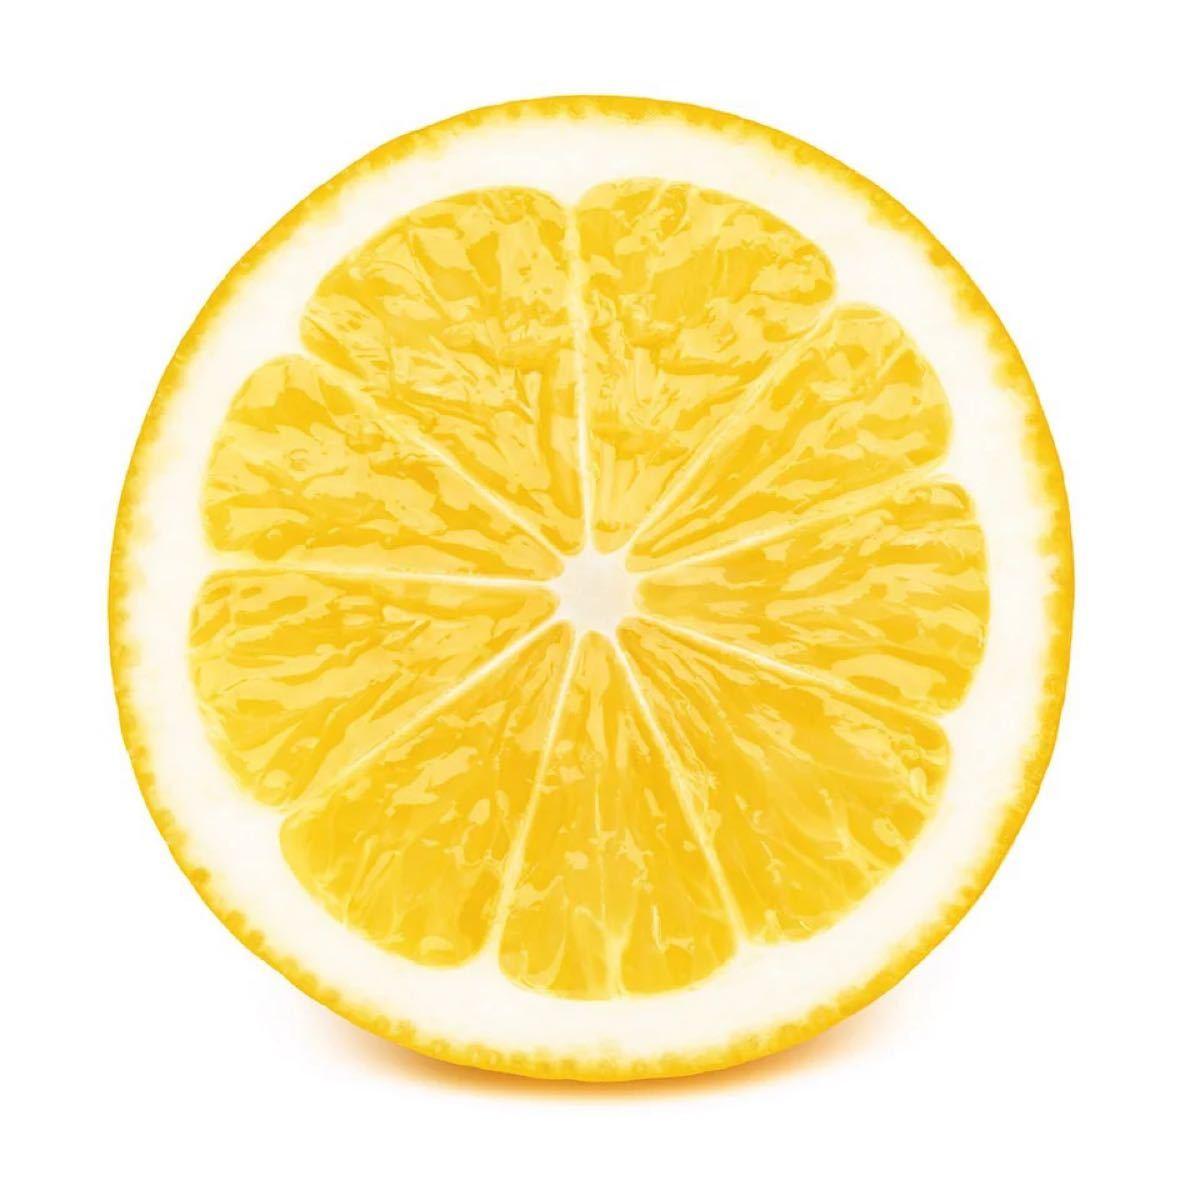 10ml 1本 精油 レモン 精油・アロマオイル・エッセンシャルオイル